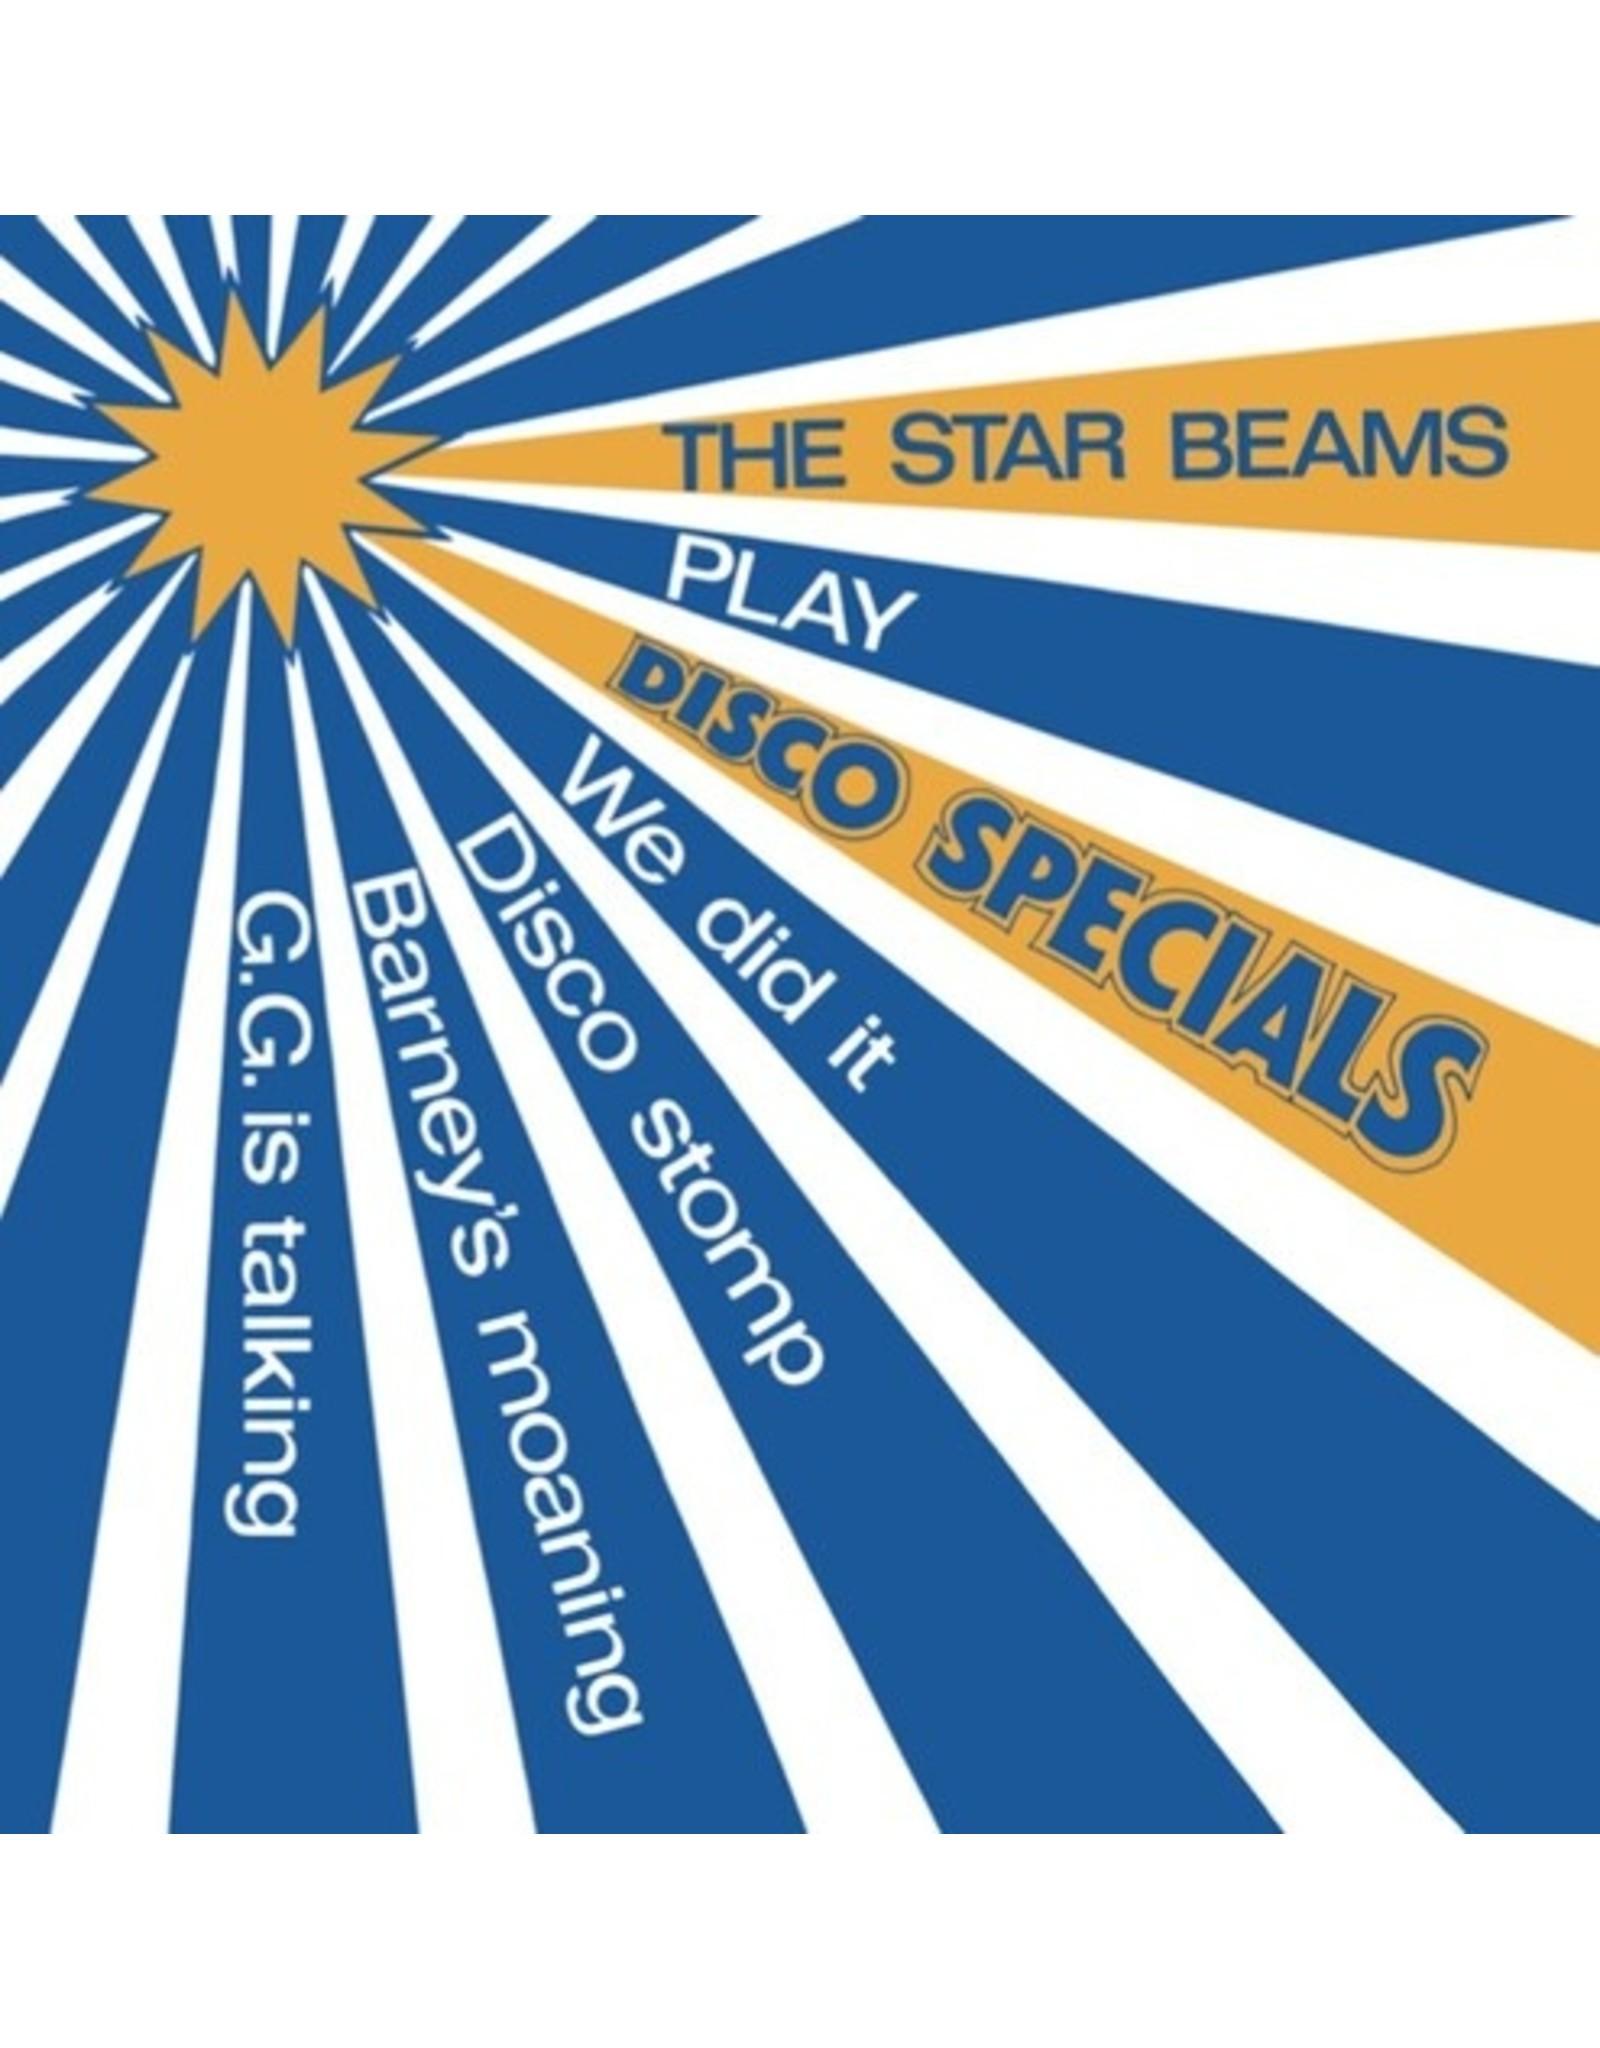 New Vinyl The Star Beams - Play Disco Specials LP